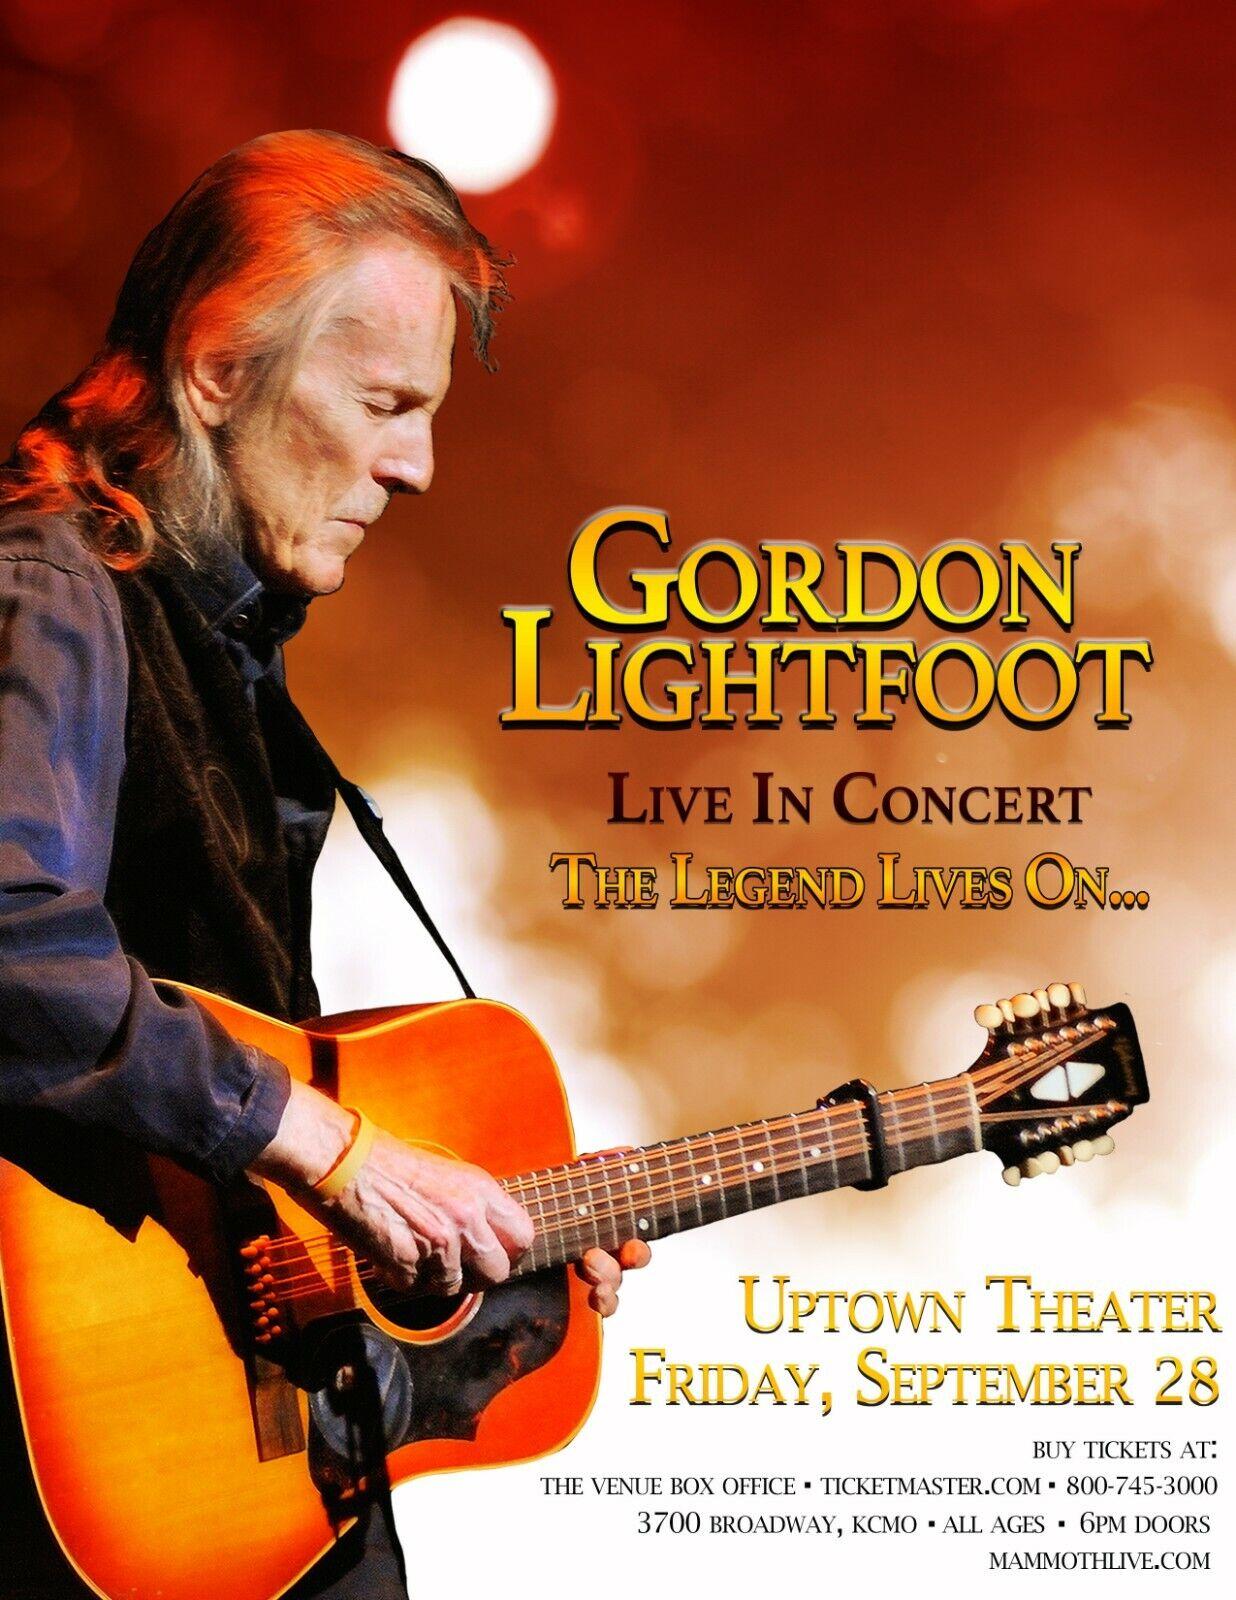 GORDON LIGHTFOOT 2018 KANSAS CITY CONCERT TOUR POSTER - Folk Rock, Country Music - $11.99